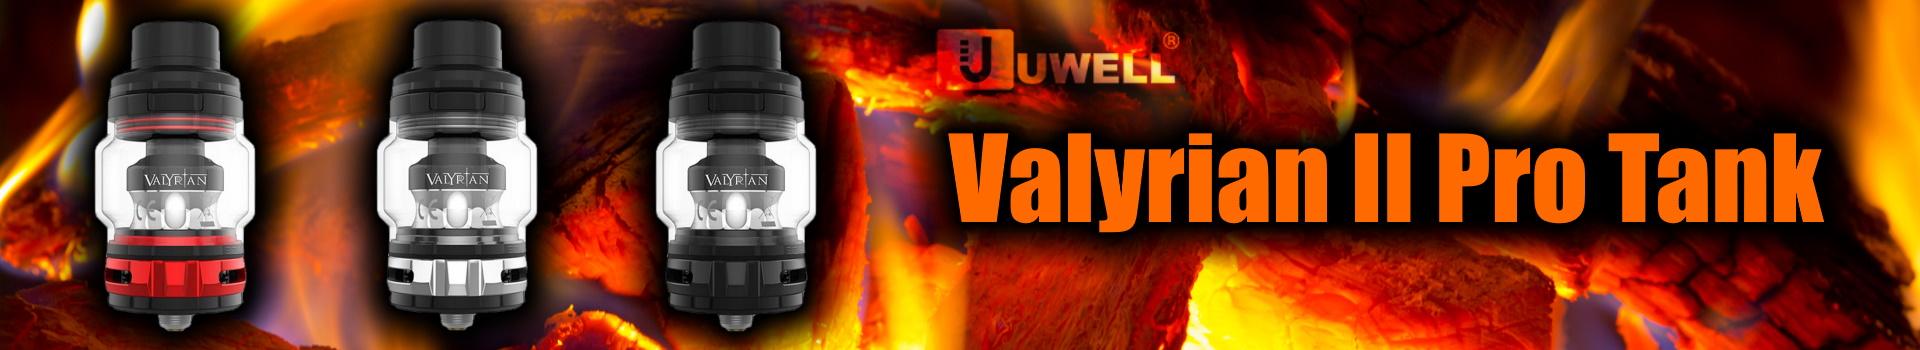 Uwell - Valyrian 2 Pro Tank Verdampfer